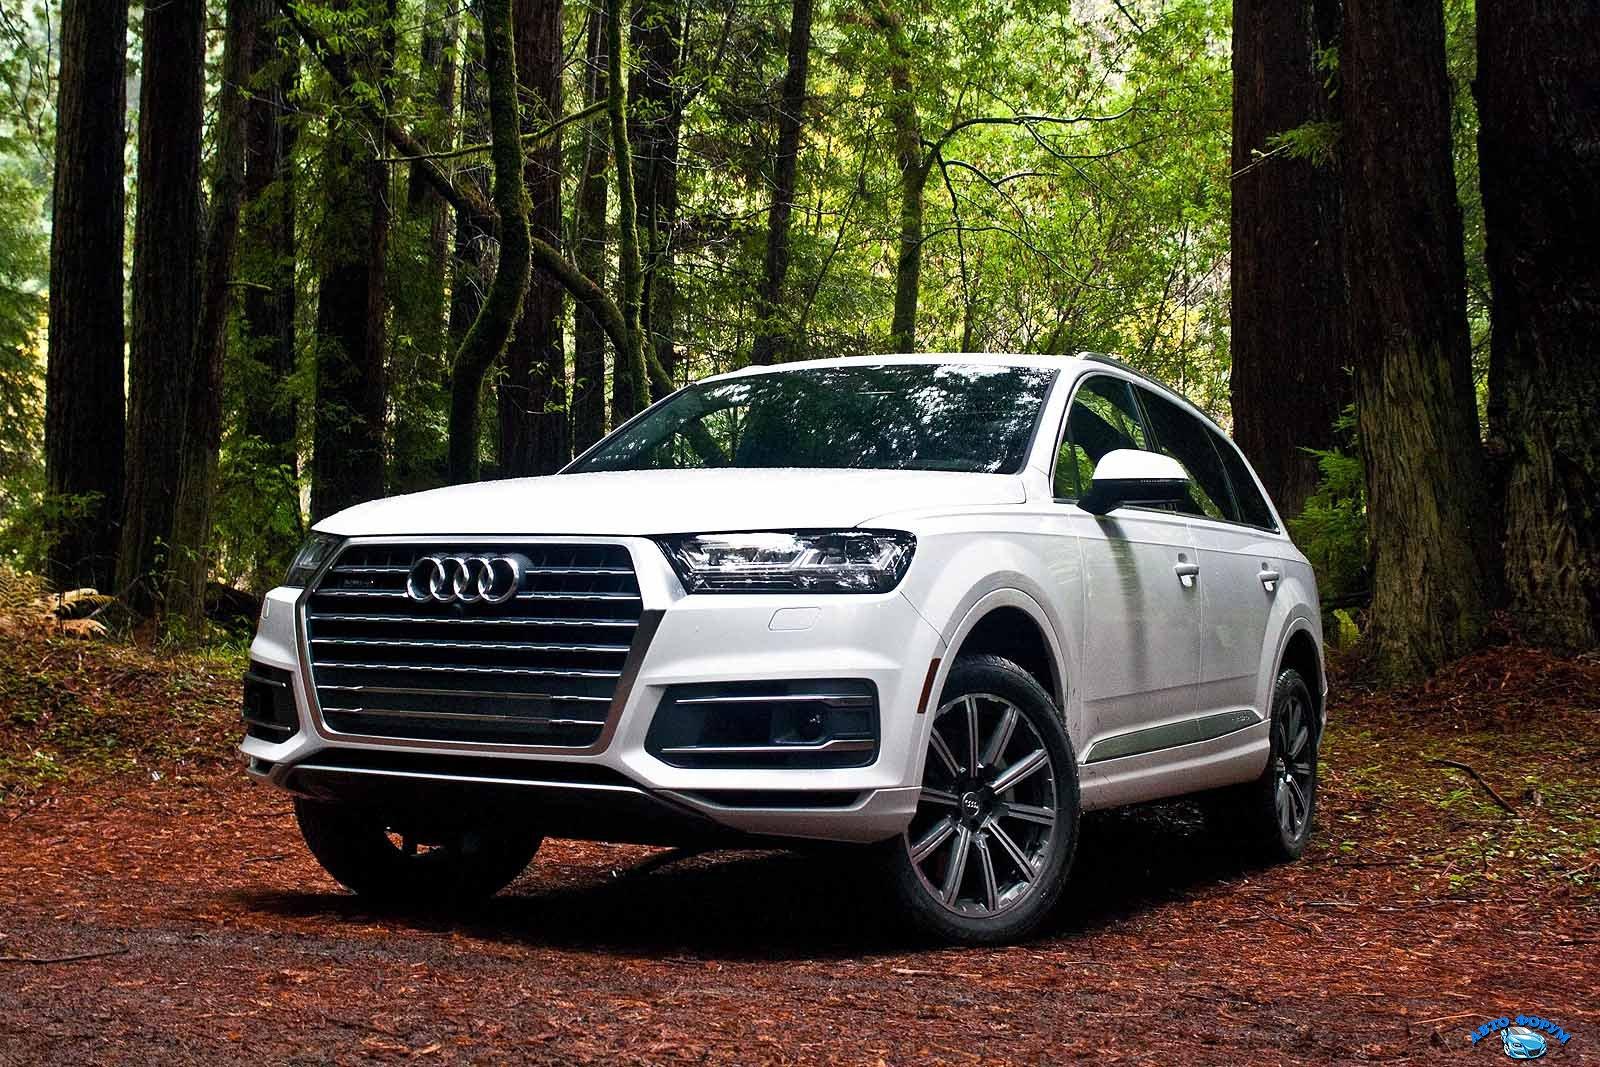 2017-Audi-Q7-27.jpg